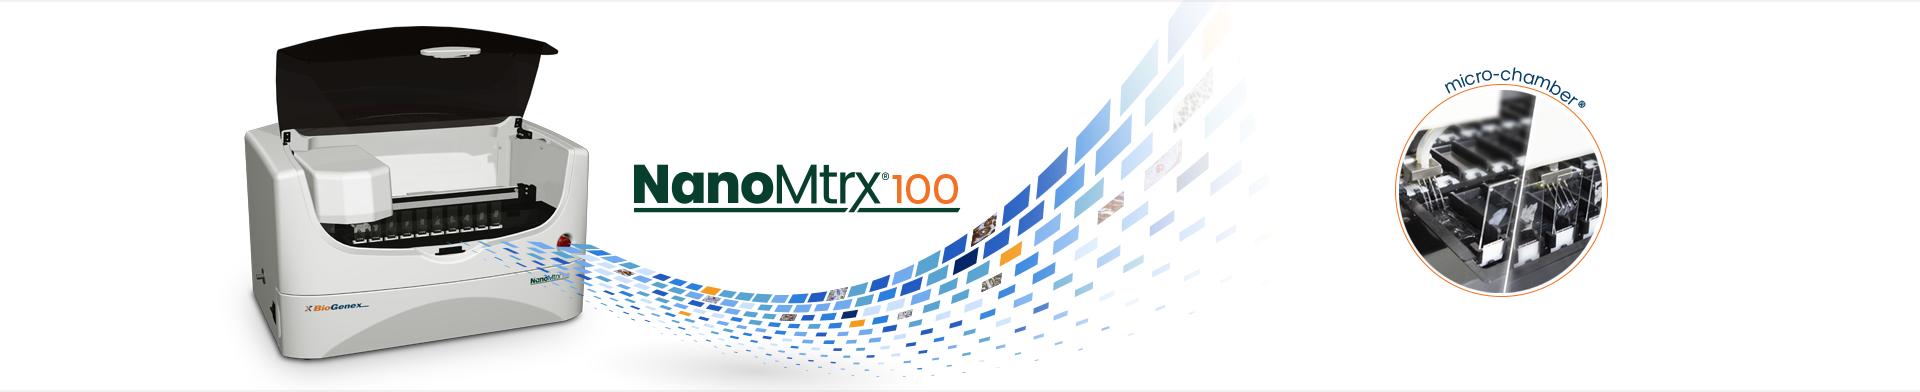 NanoMtrx® 100